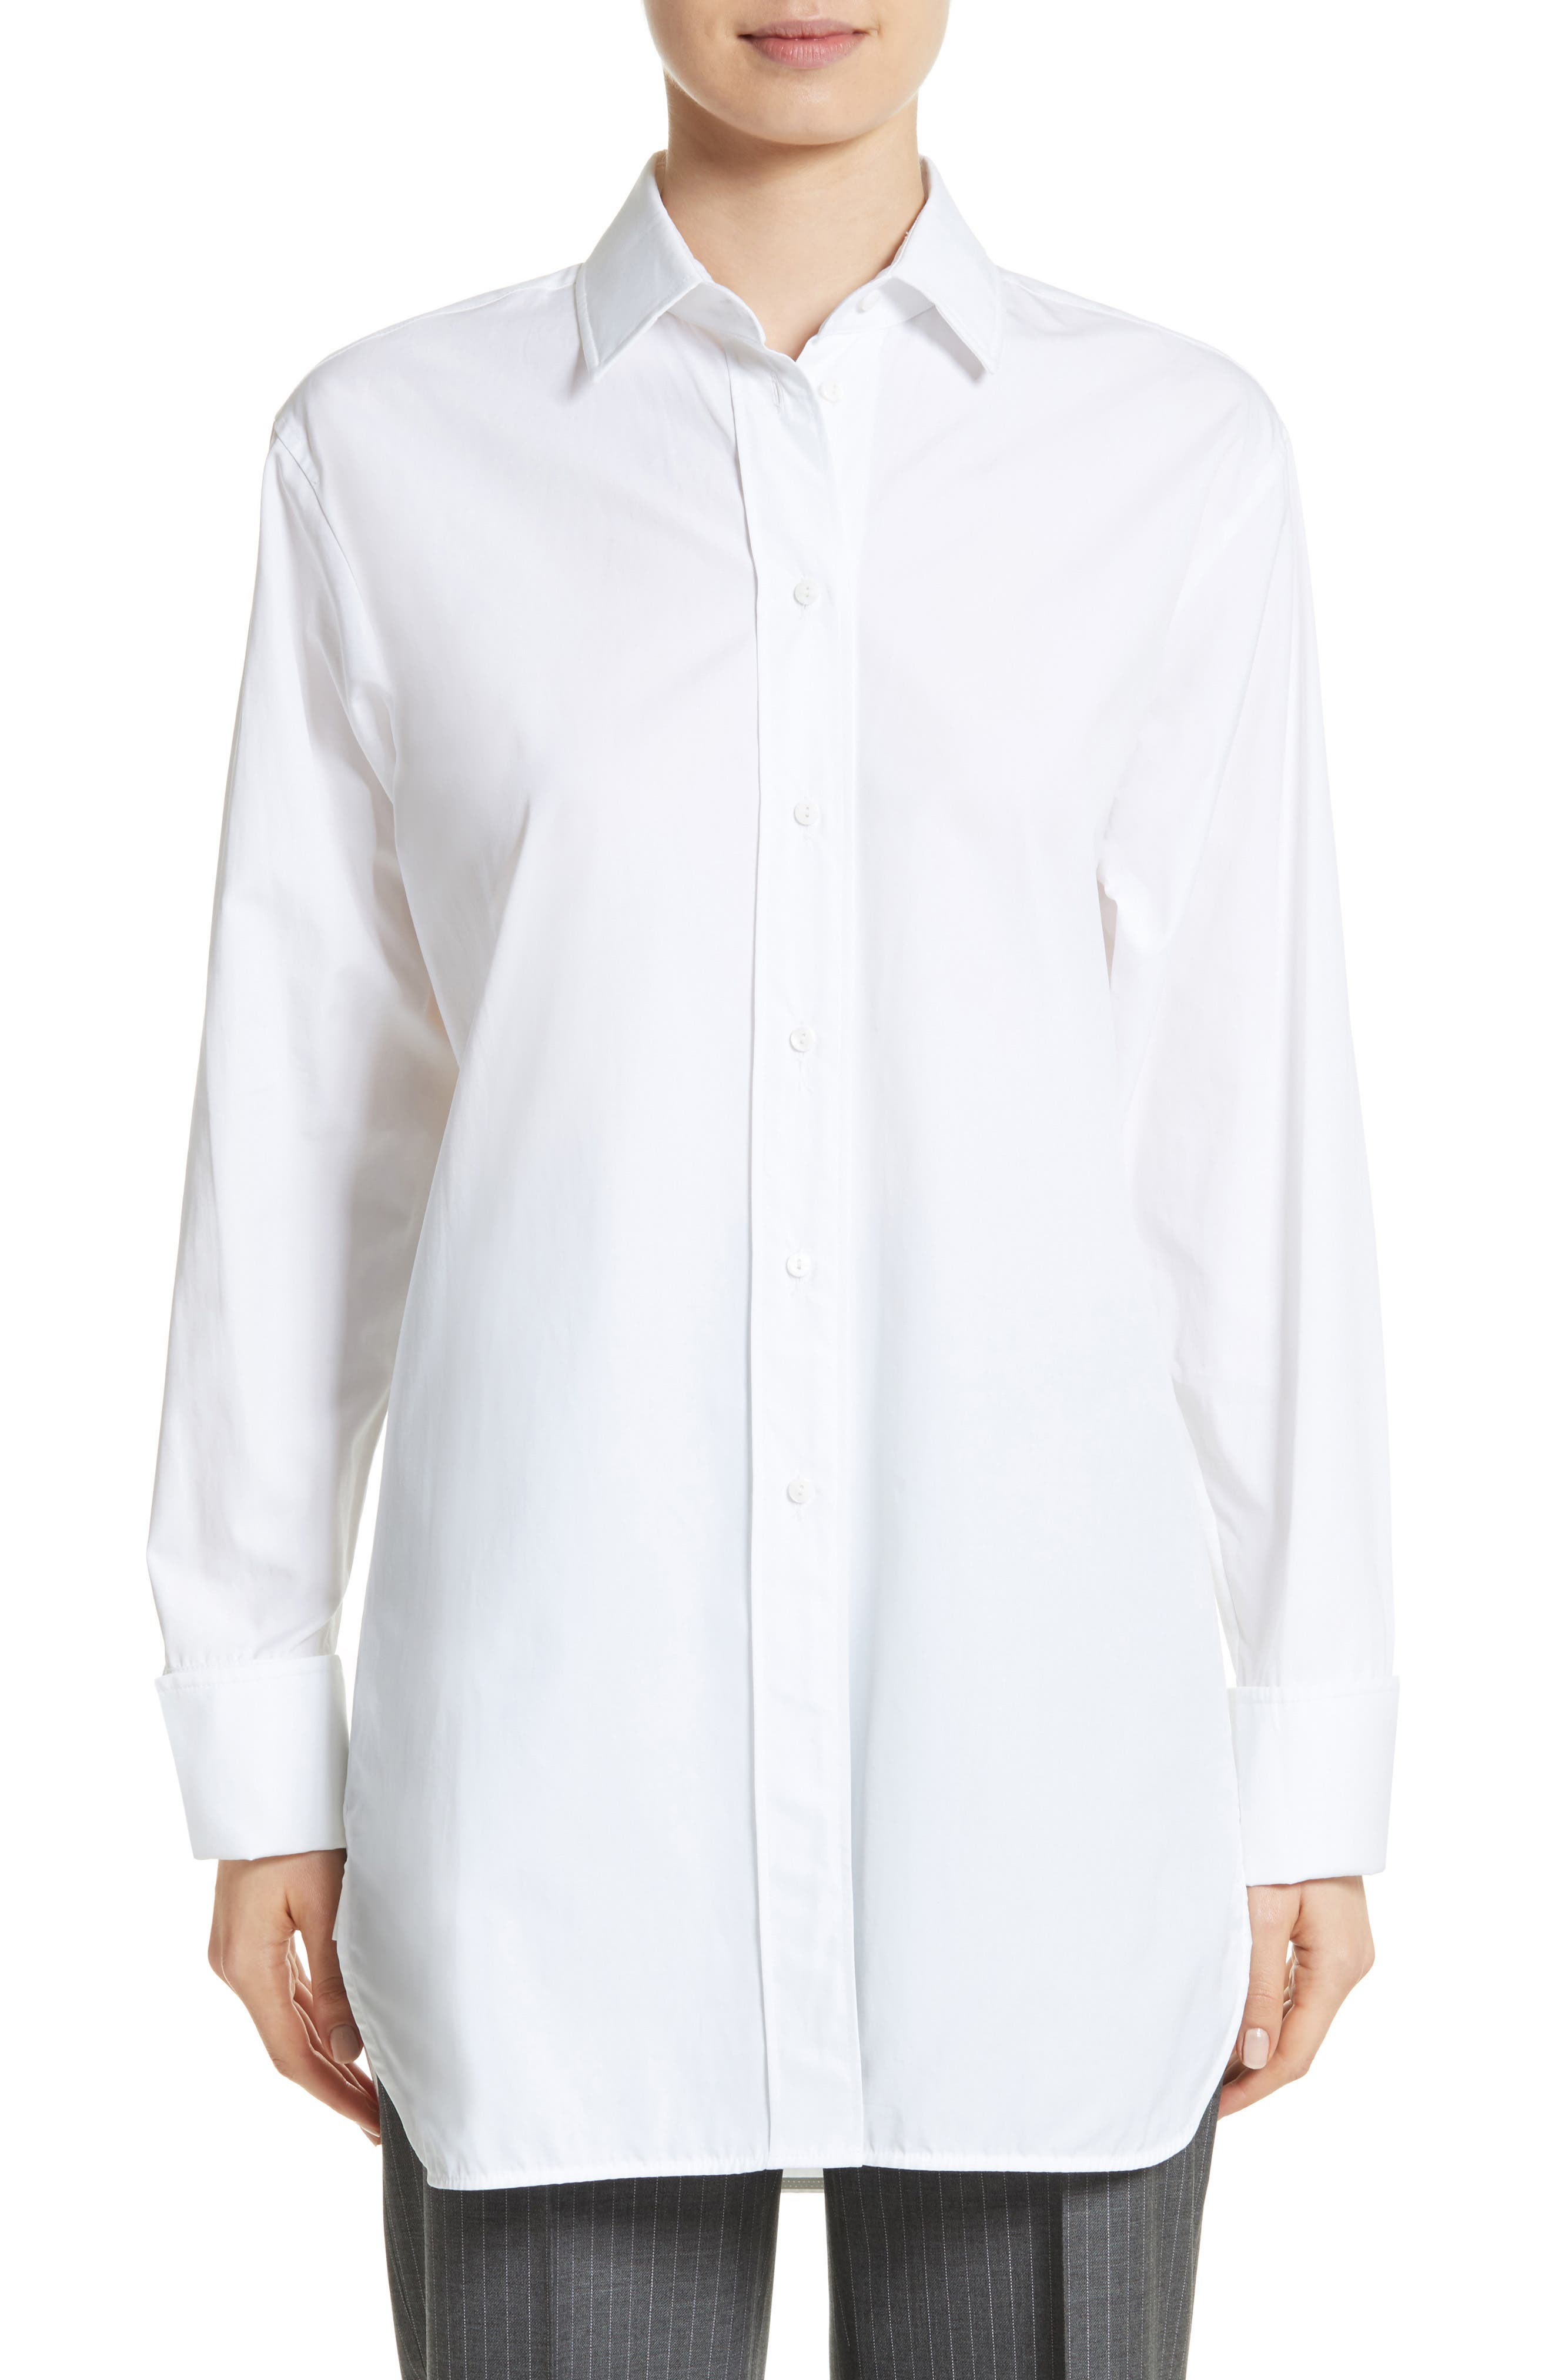 Visivo Cotton Poplin Shirt,                             Main thumbnail 1, color,                             101